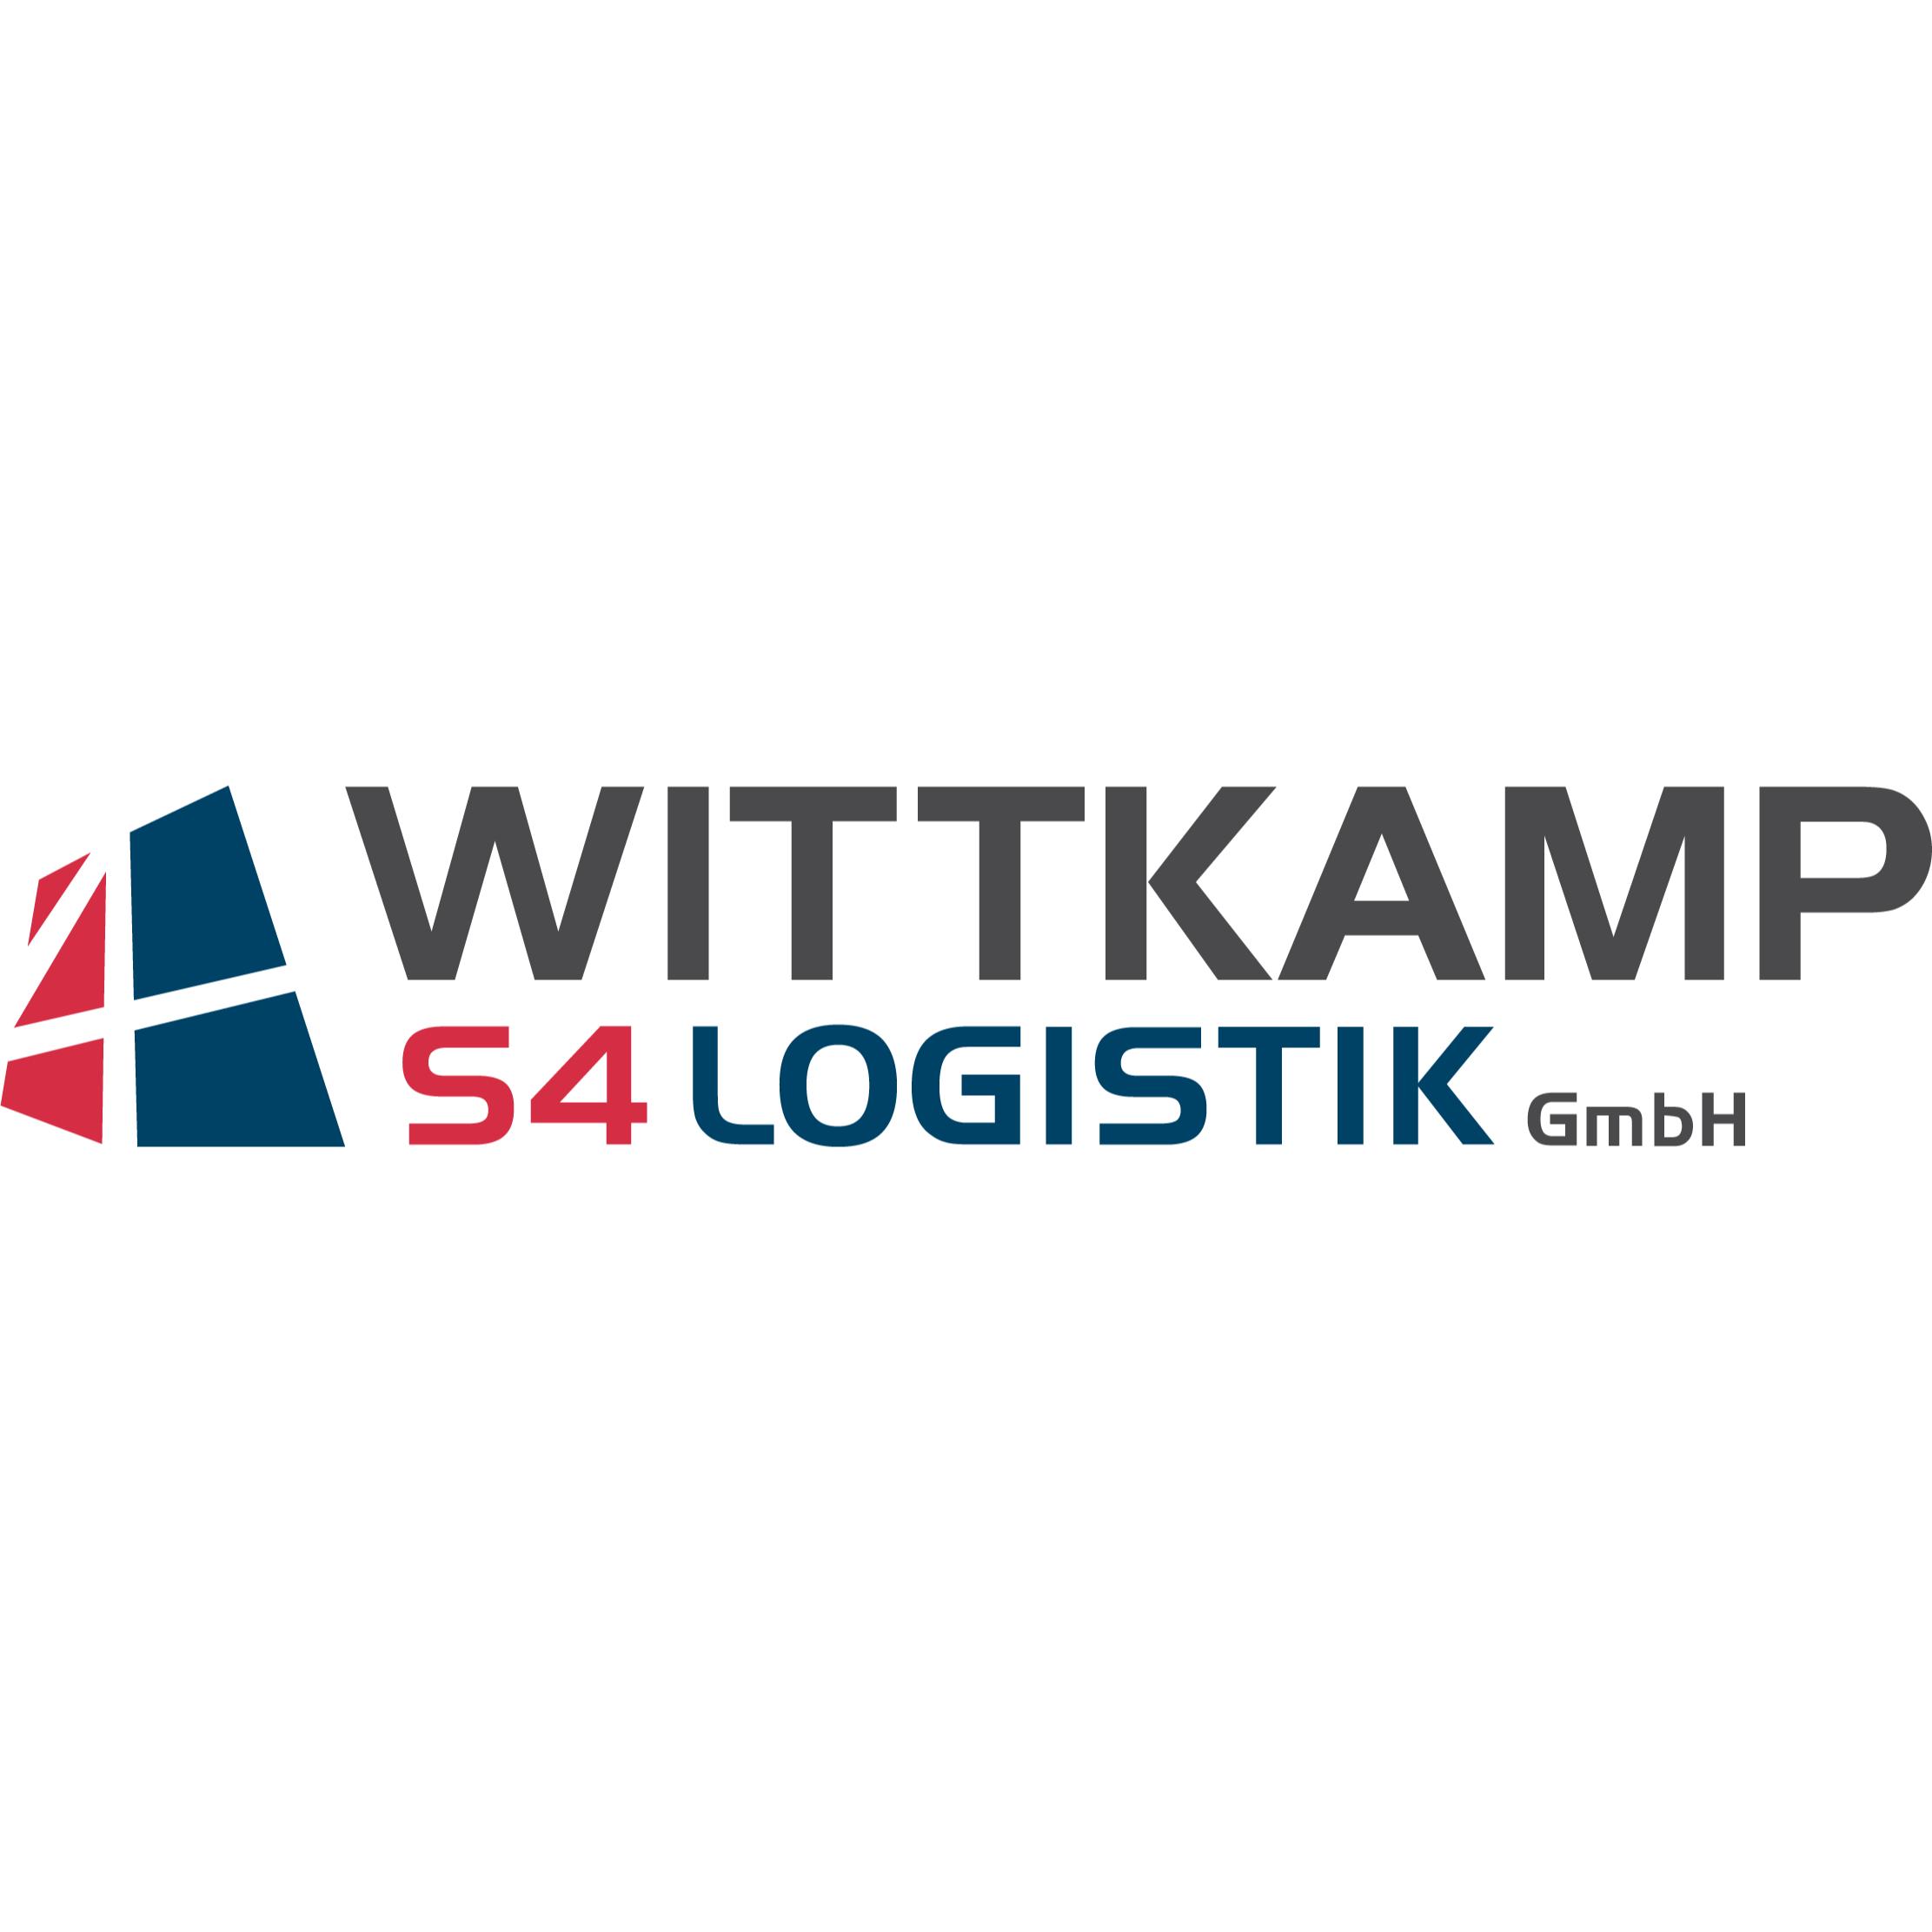 Wittkamp S4 Logistik GmbH